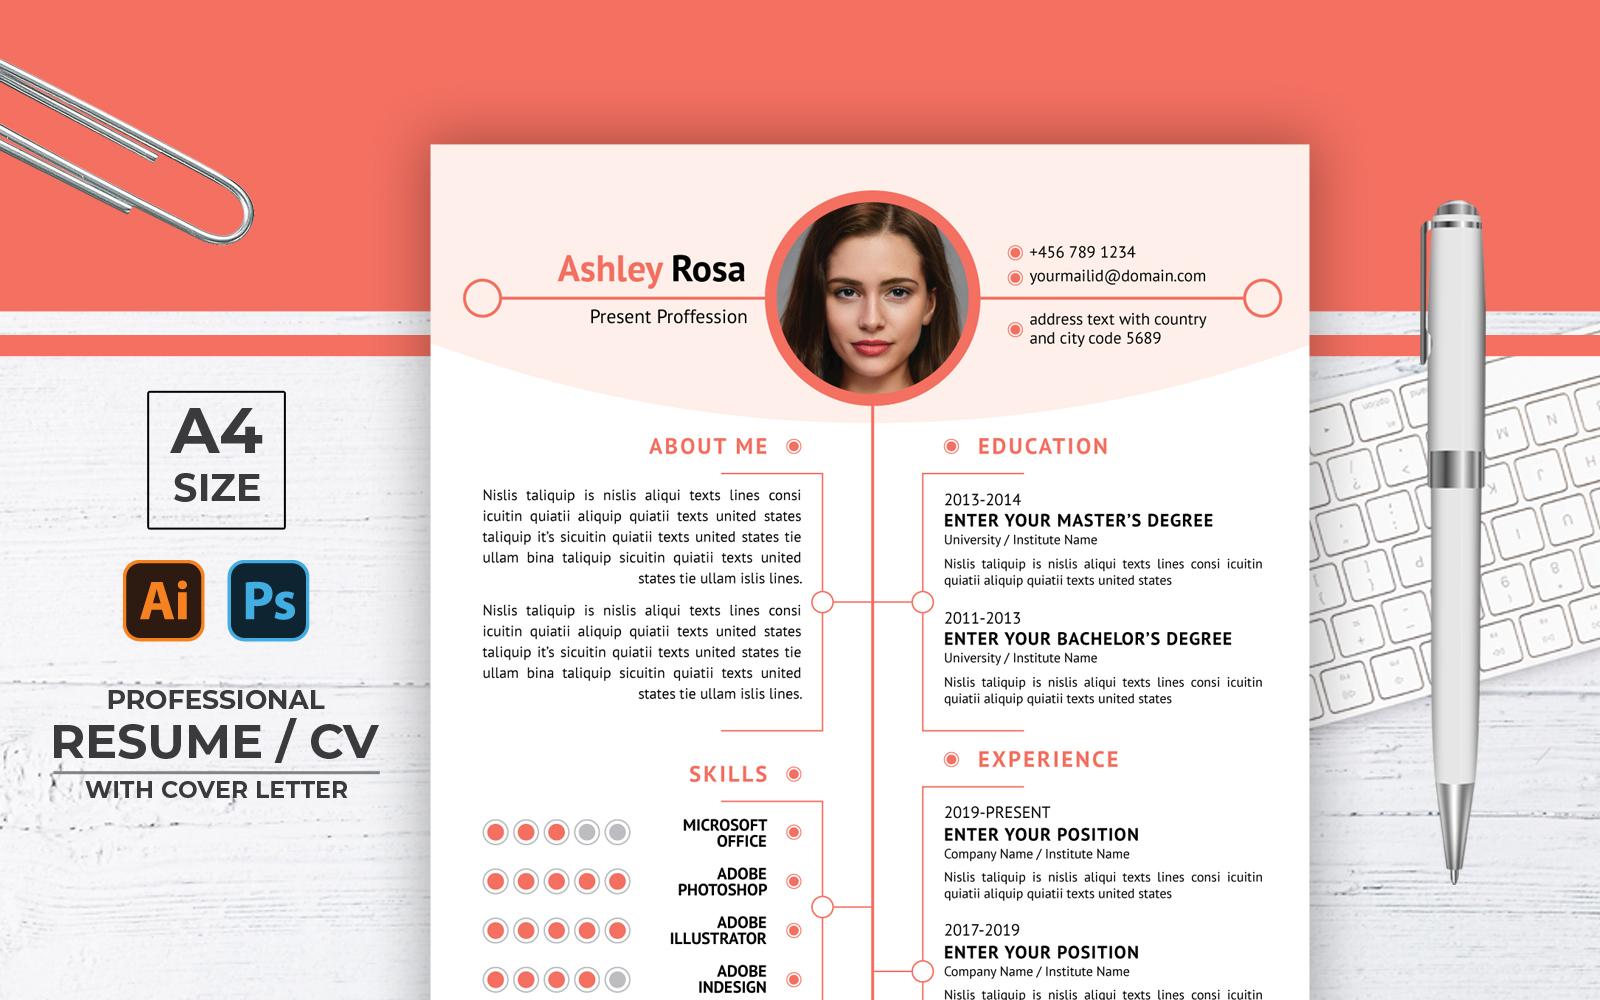 Szablon resume Ashley Rosa Creative CV #123162